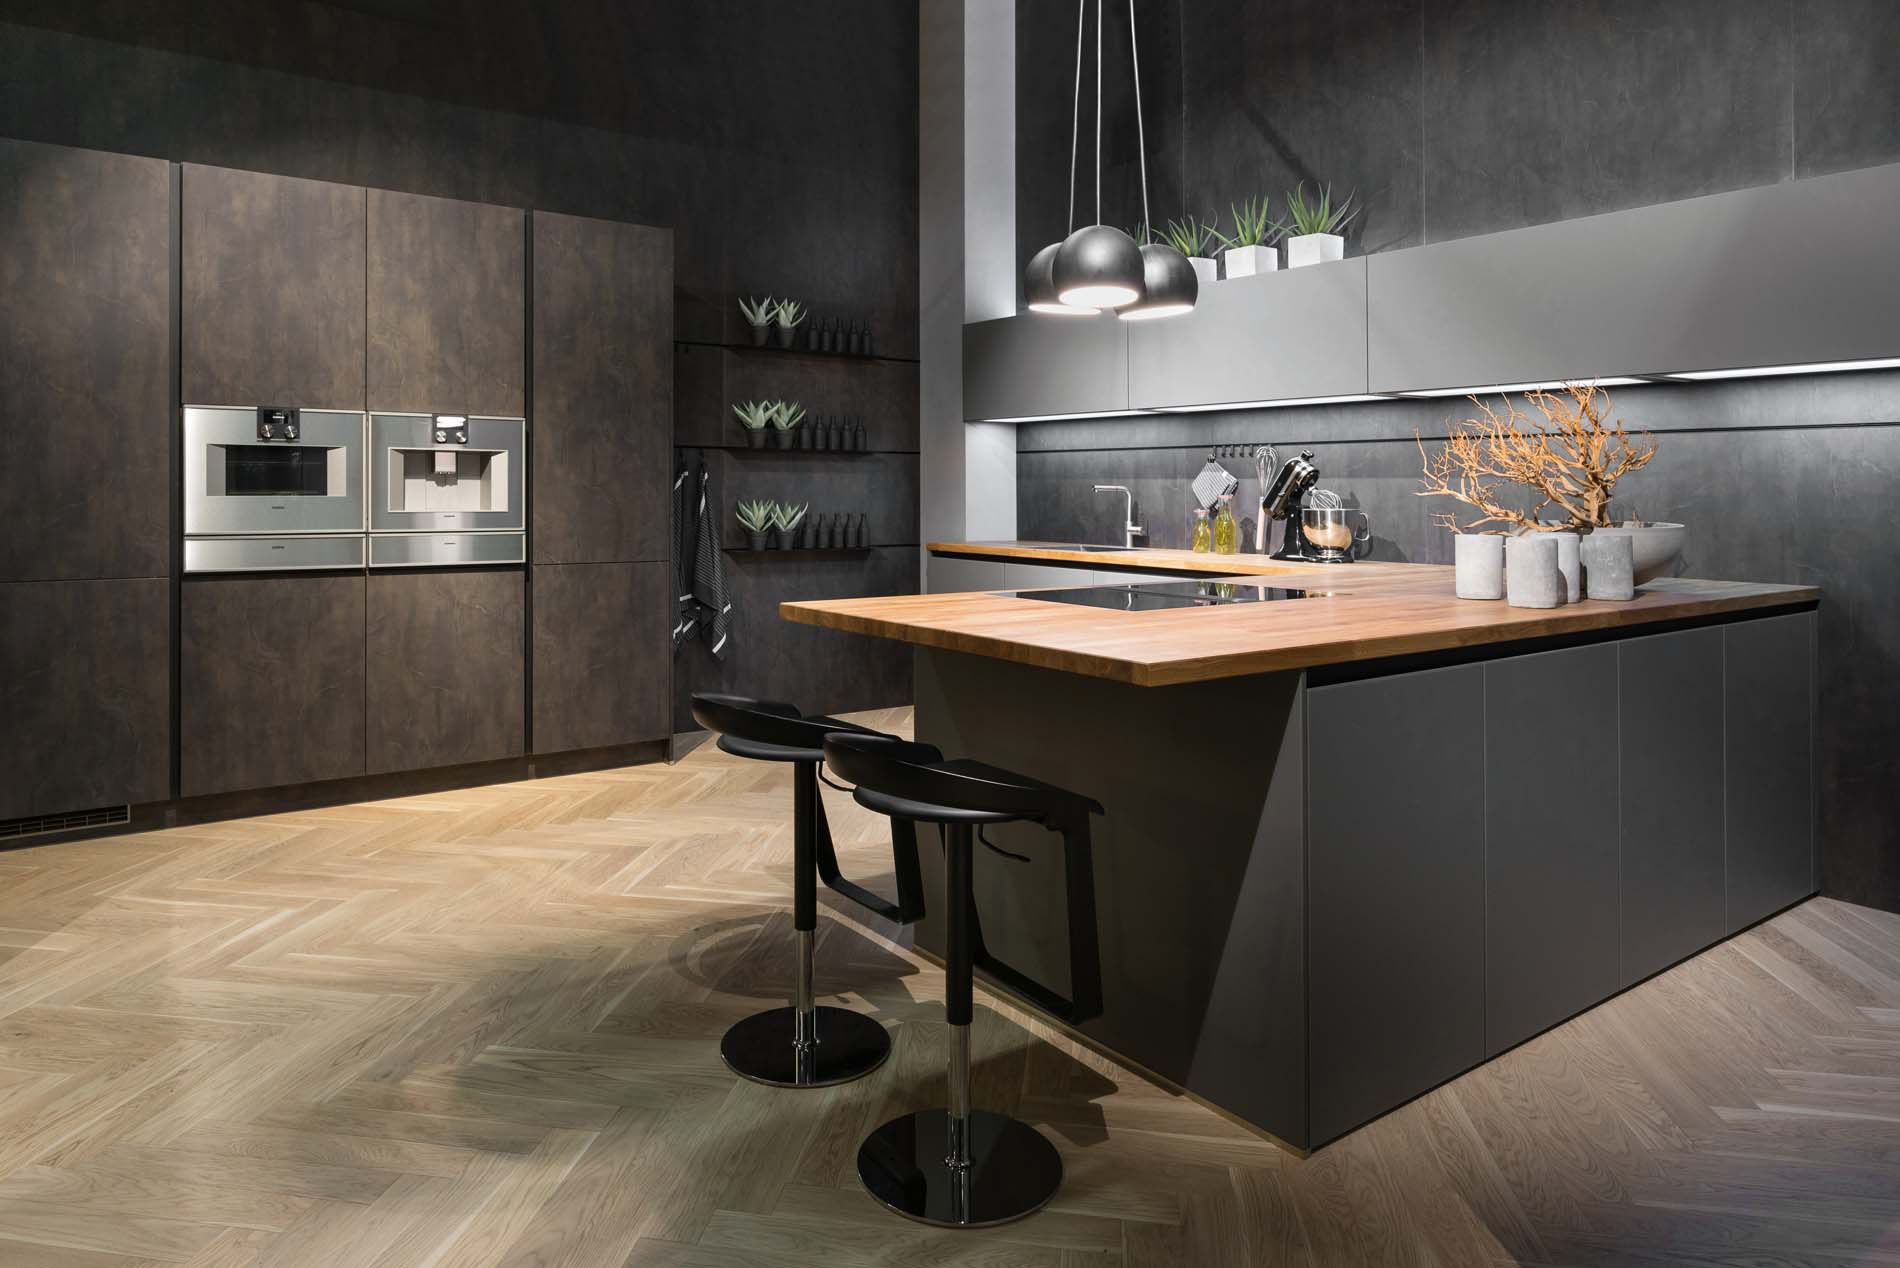 Exclusieve Keukens Nieuwe Keuken Kopen Aswa Keukens